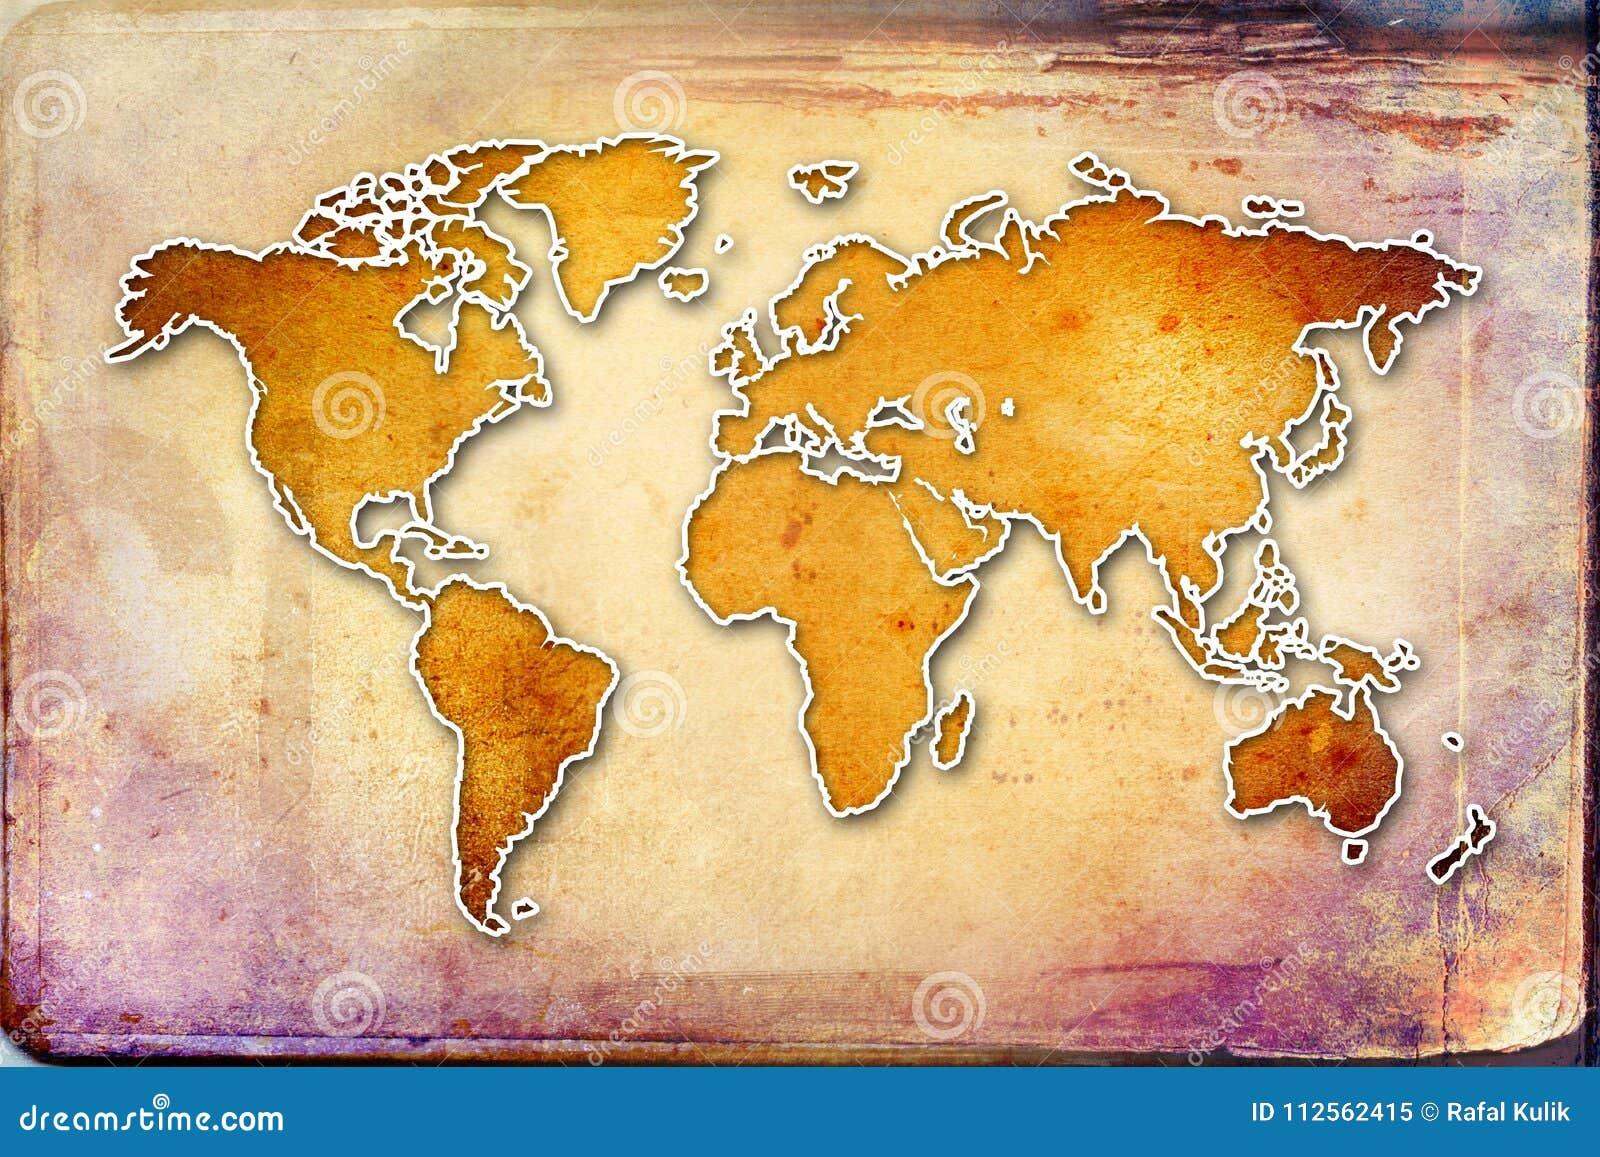 Authentic World Map.World Map Paint Design Art Illustration Stock Illustration